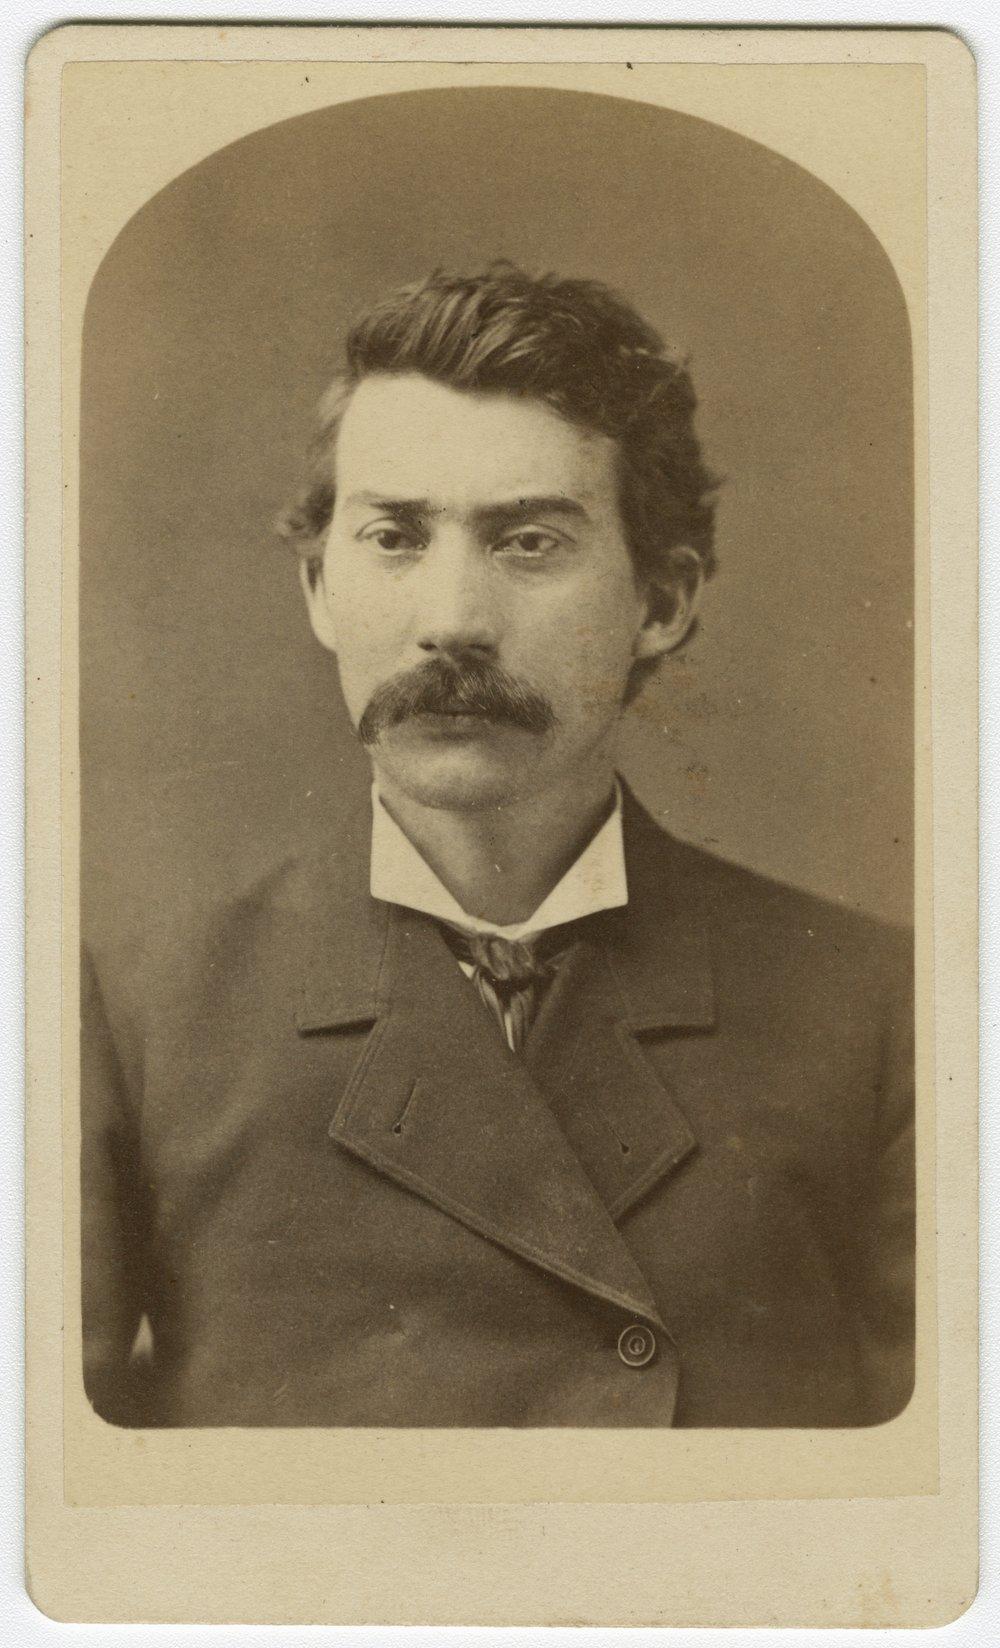 Louis A. Myers - 1